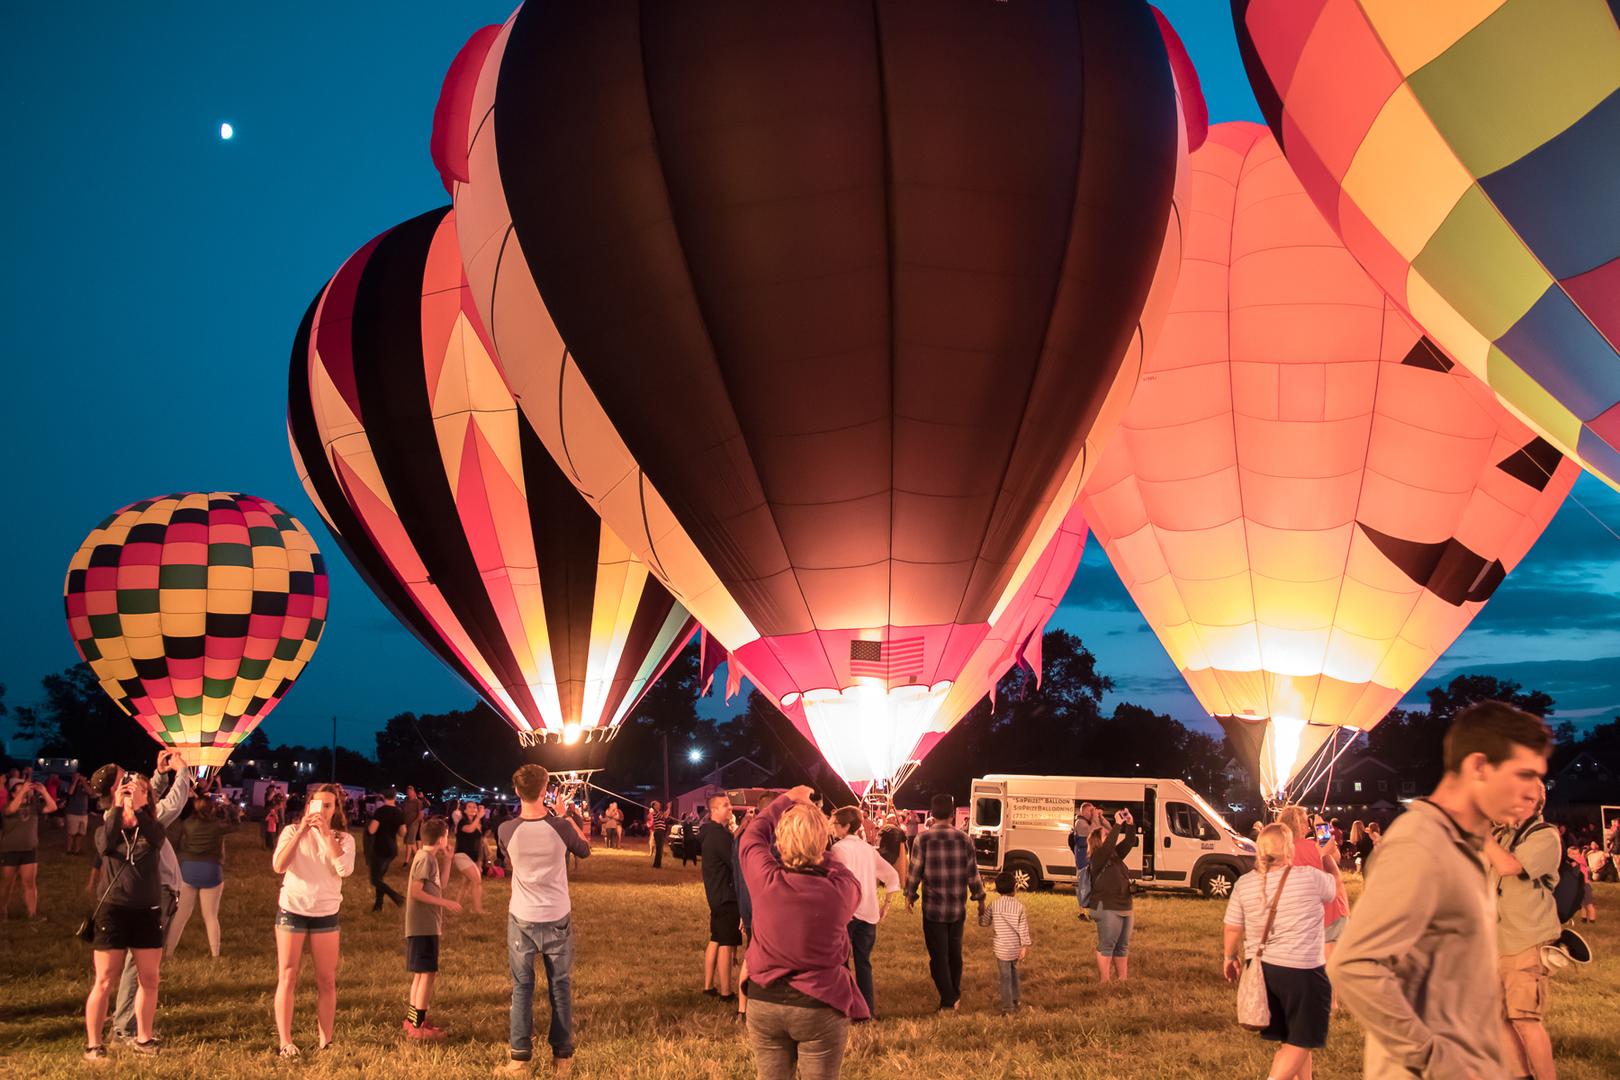 2021 Lancaster Hot Air Balloon Festival